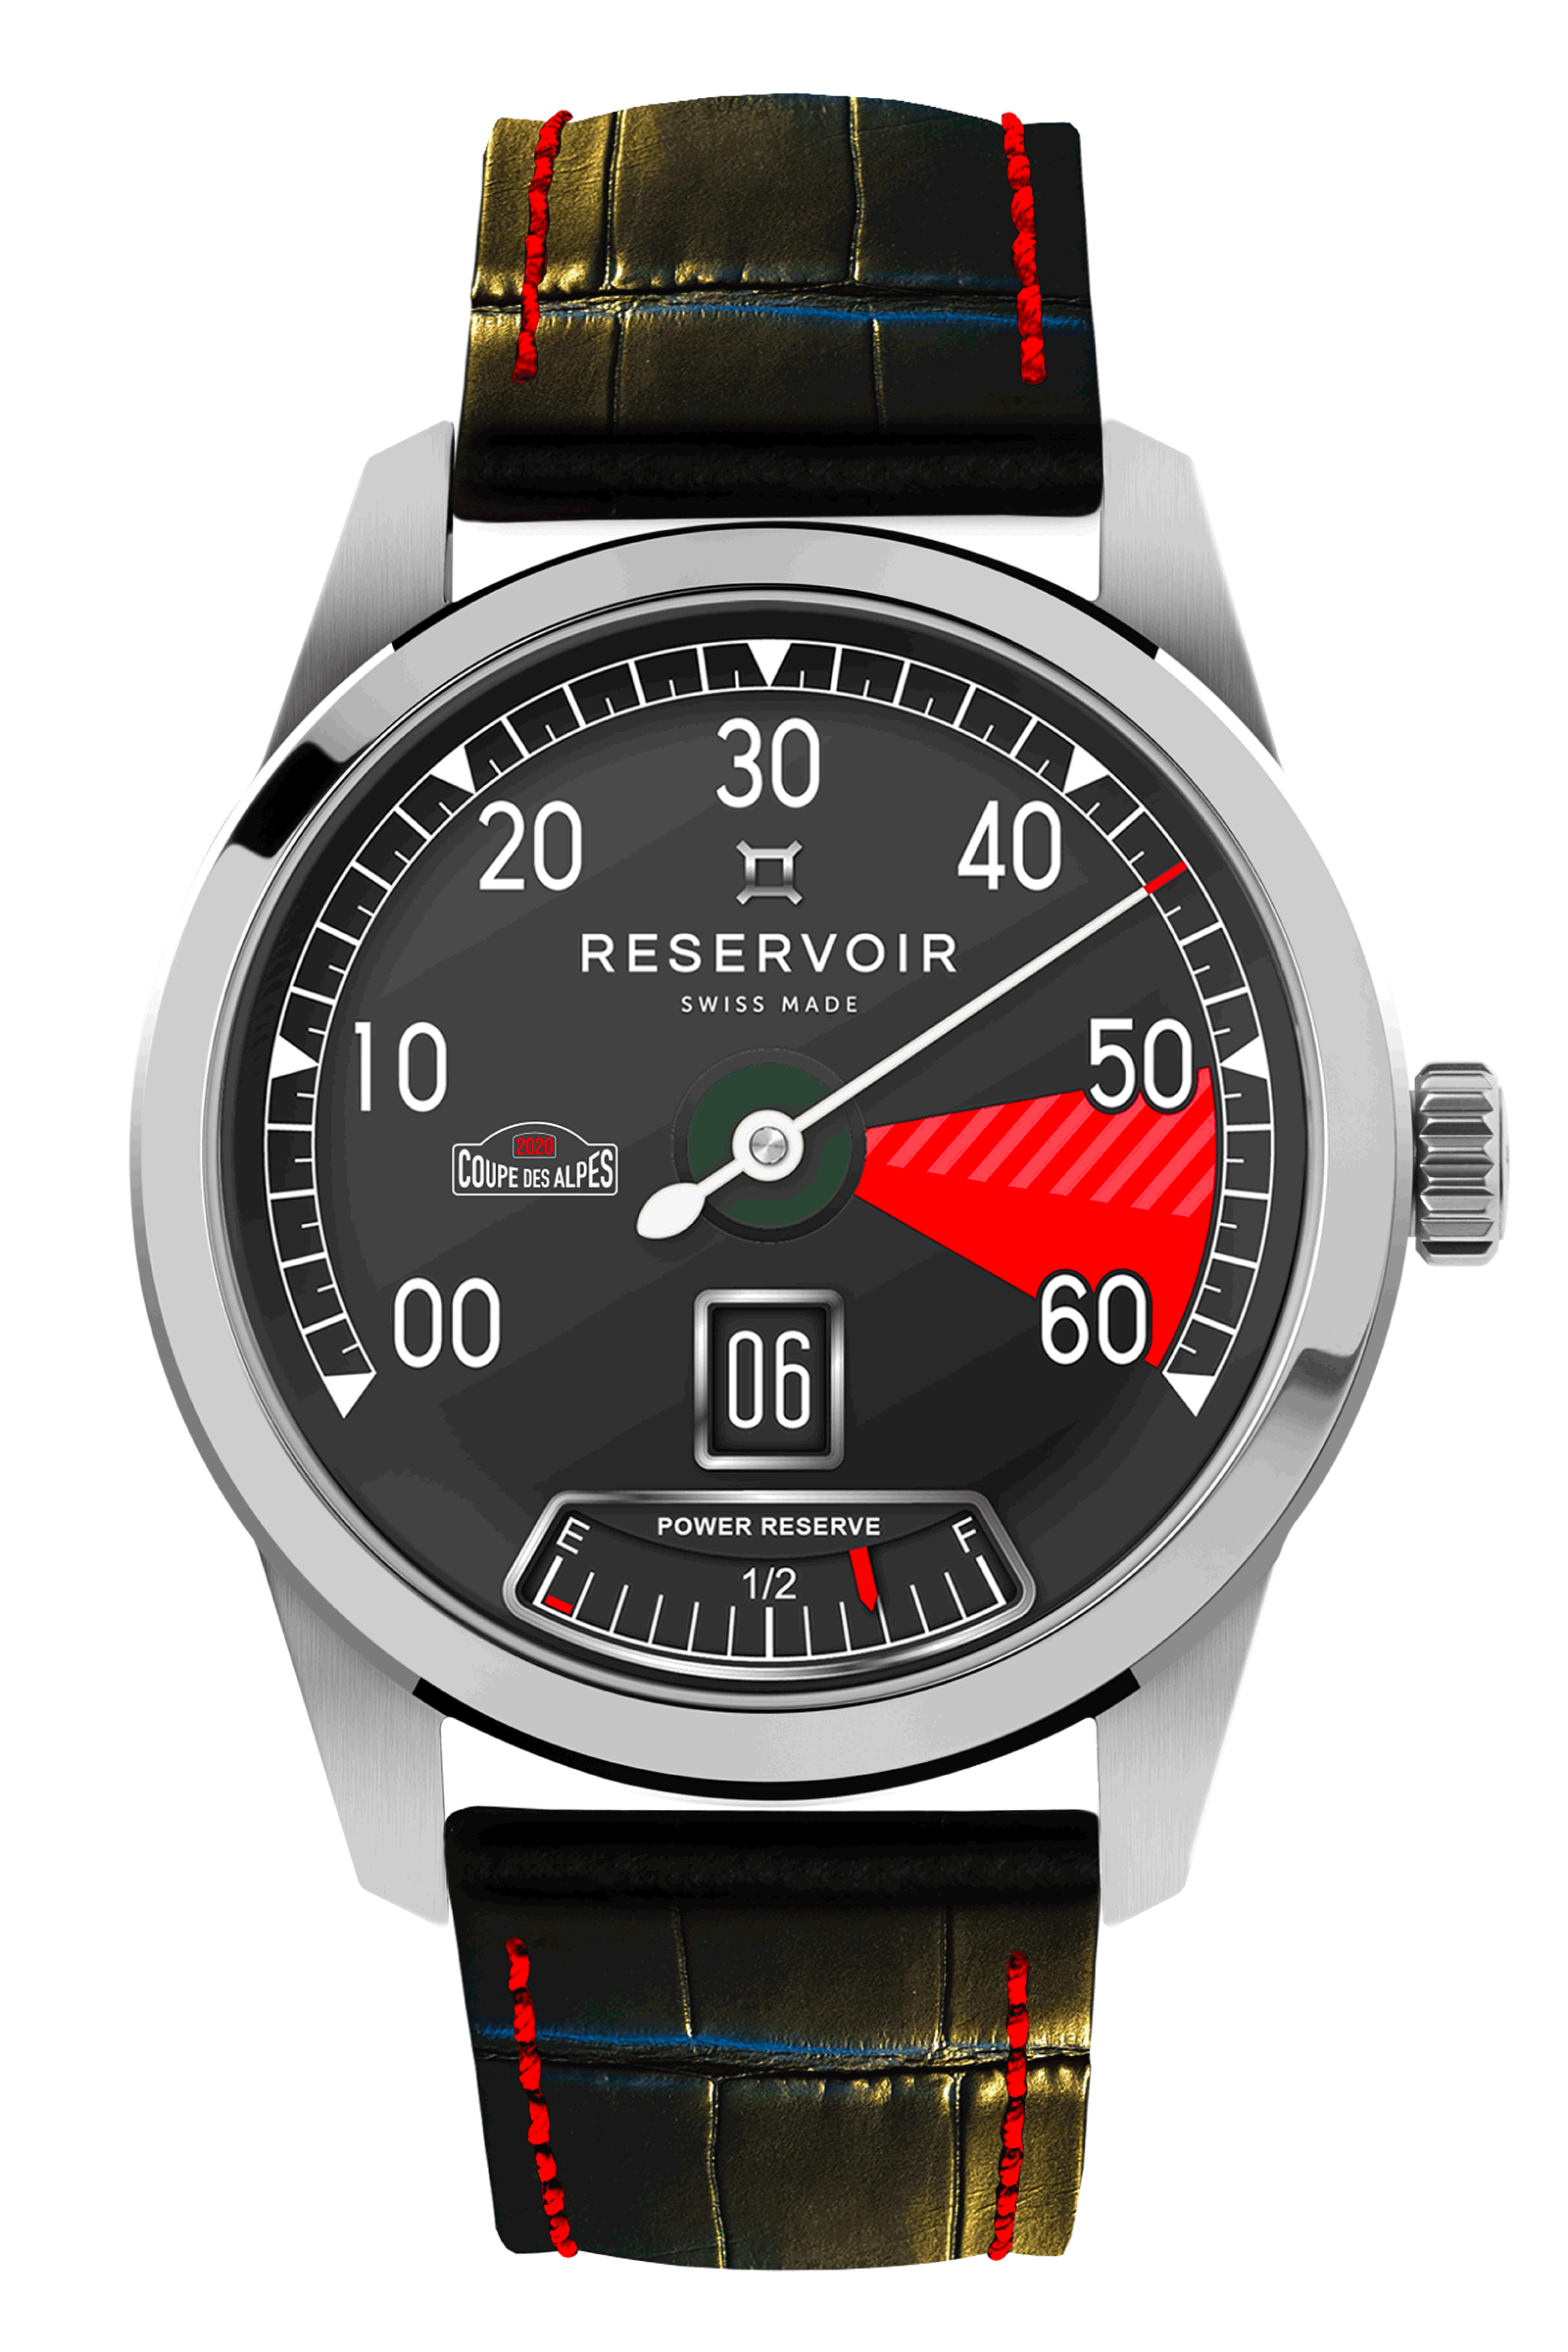 reservoir watch supercharged coupe des alpes 2020